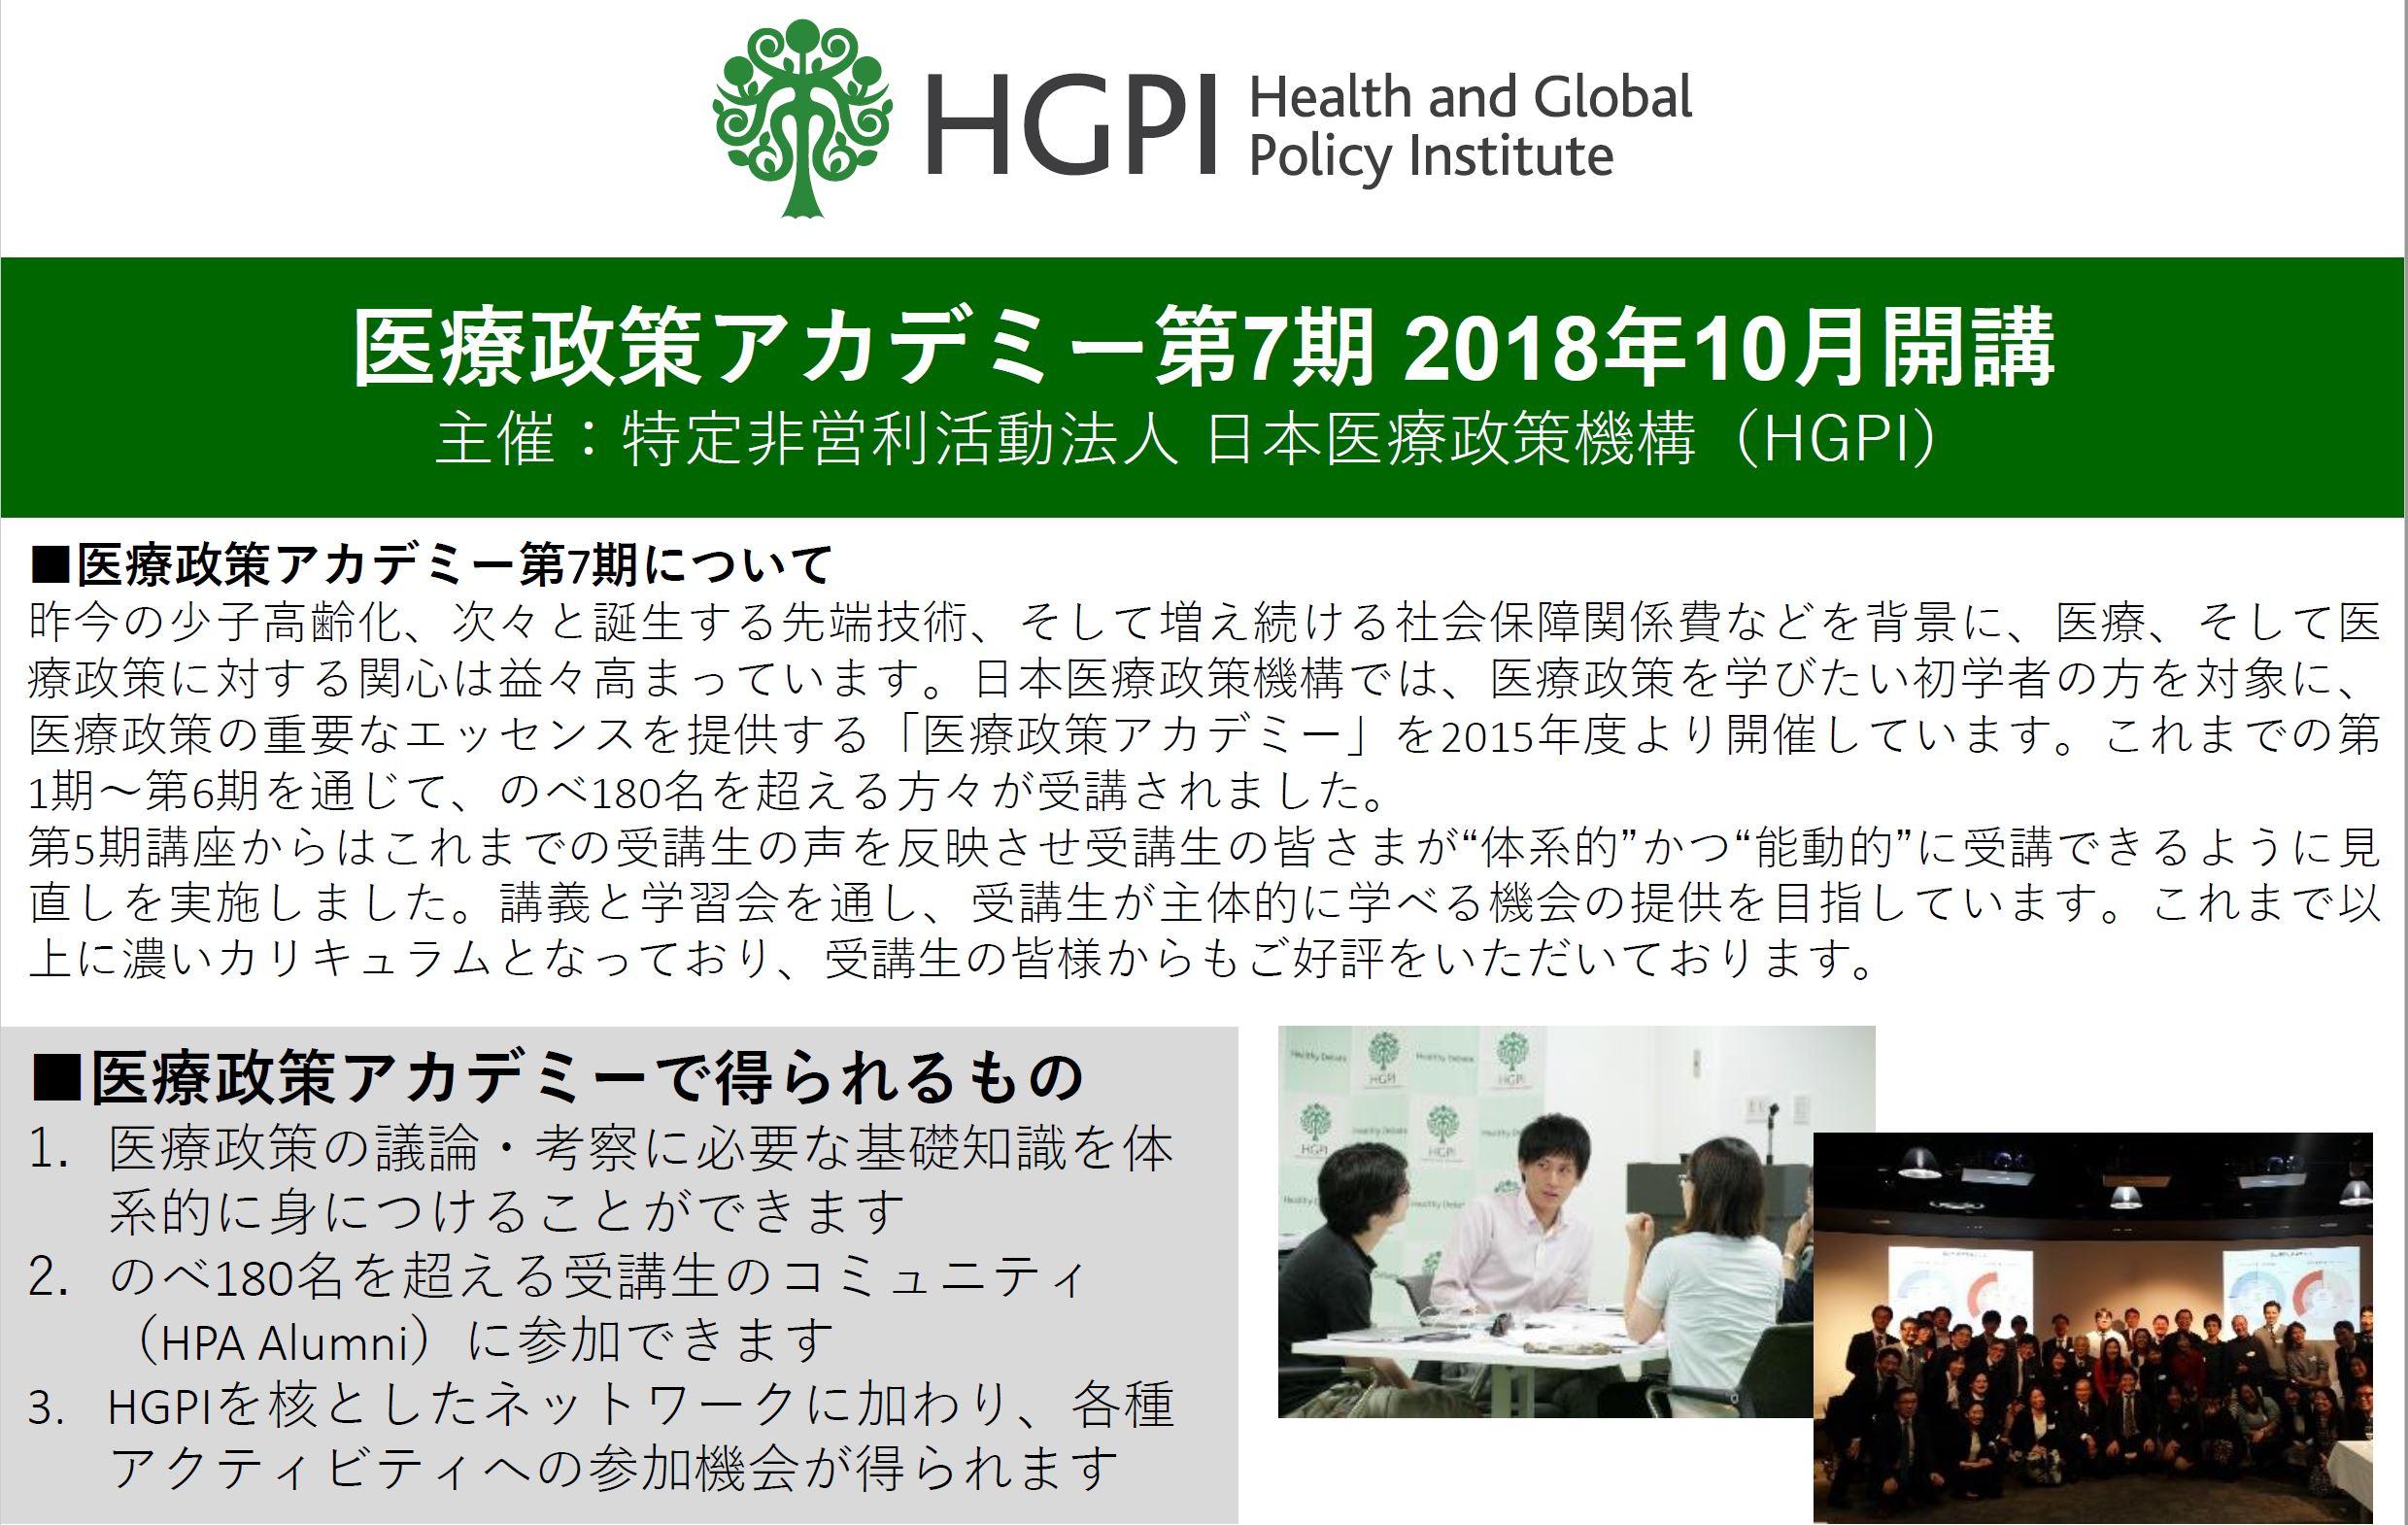 【受付終了】医療政策アカデミー第7期(2018年10月開講)